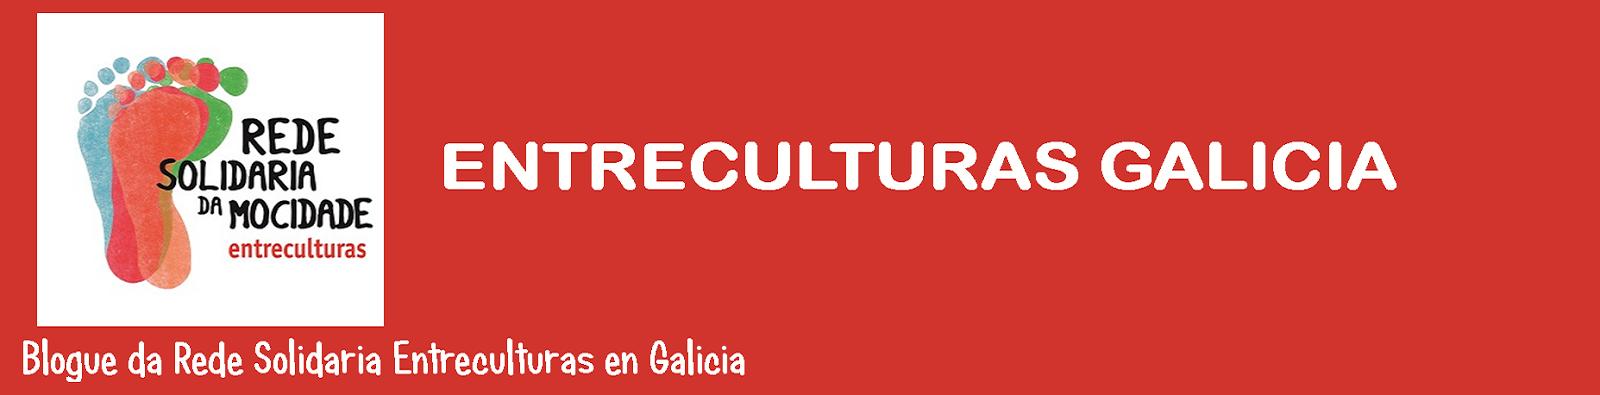 ENTRECULTURAS GALICIA